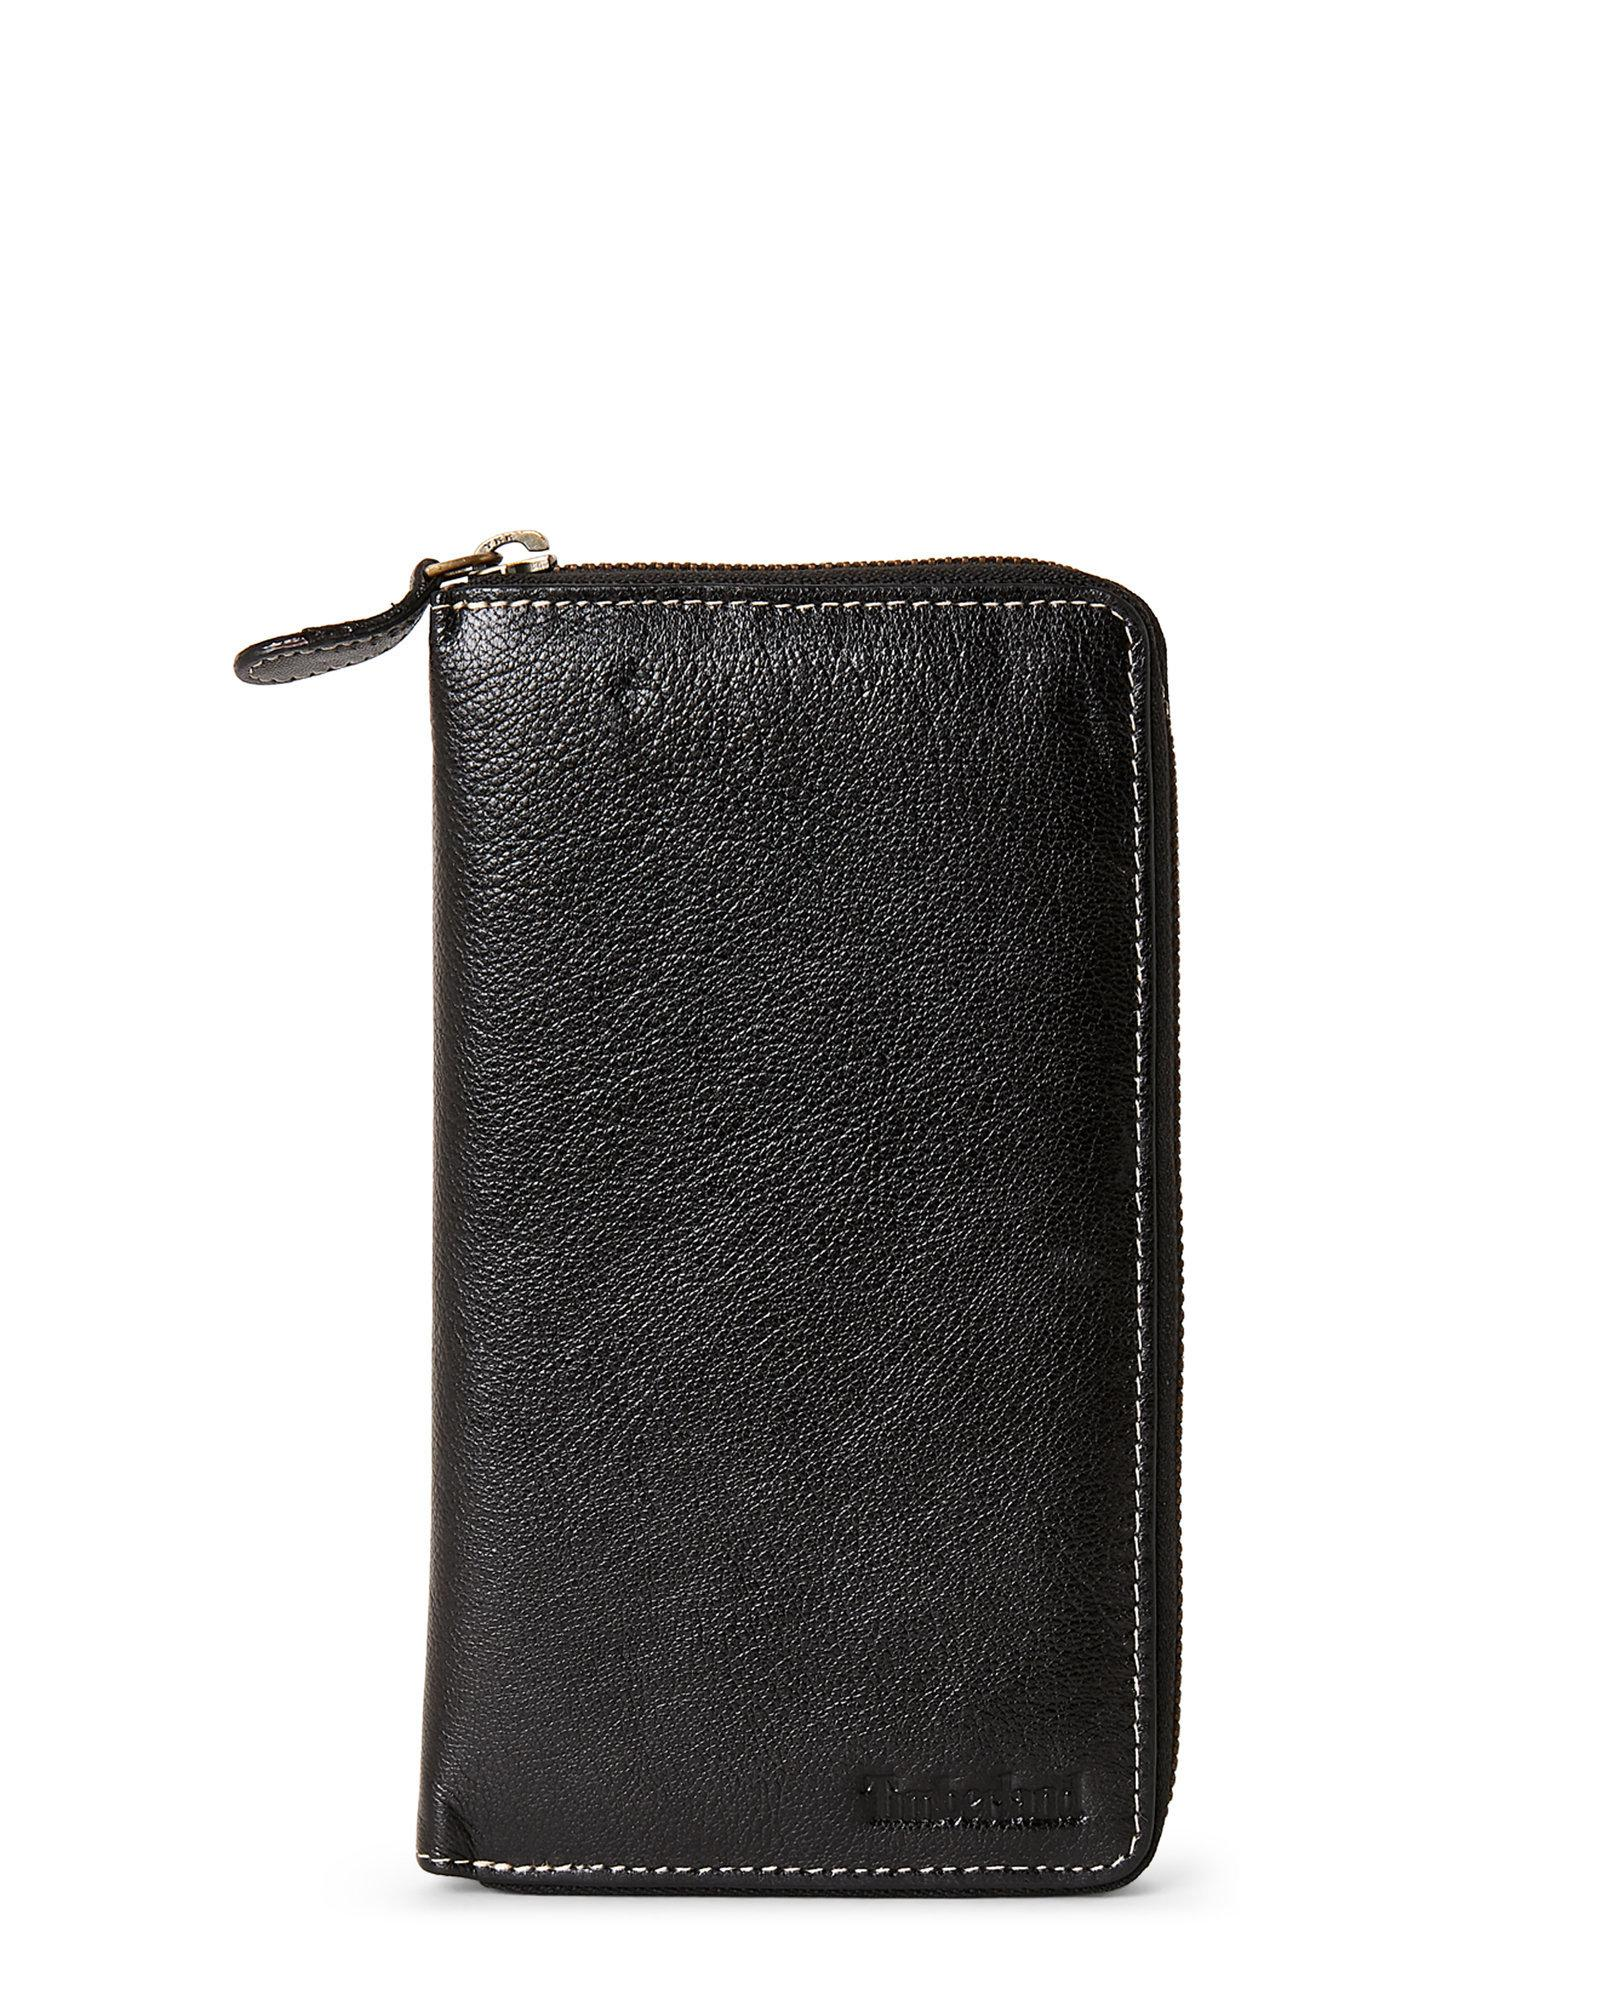 Womens Zip Around Woman Wallet Purse Timberland Ilxtl8bky